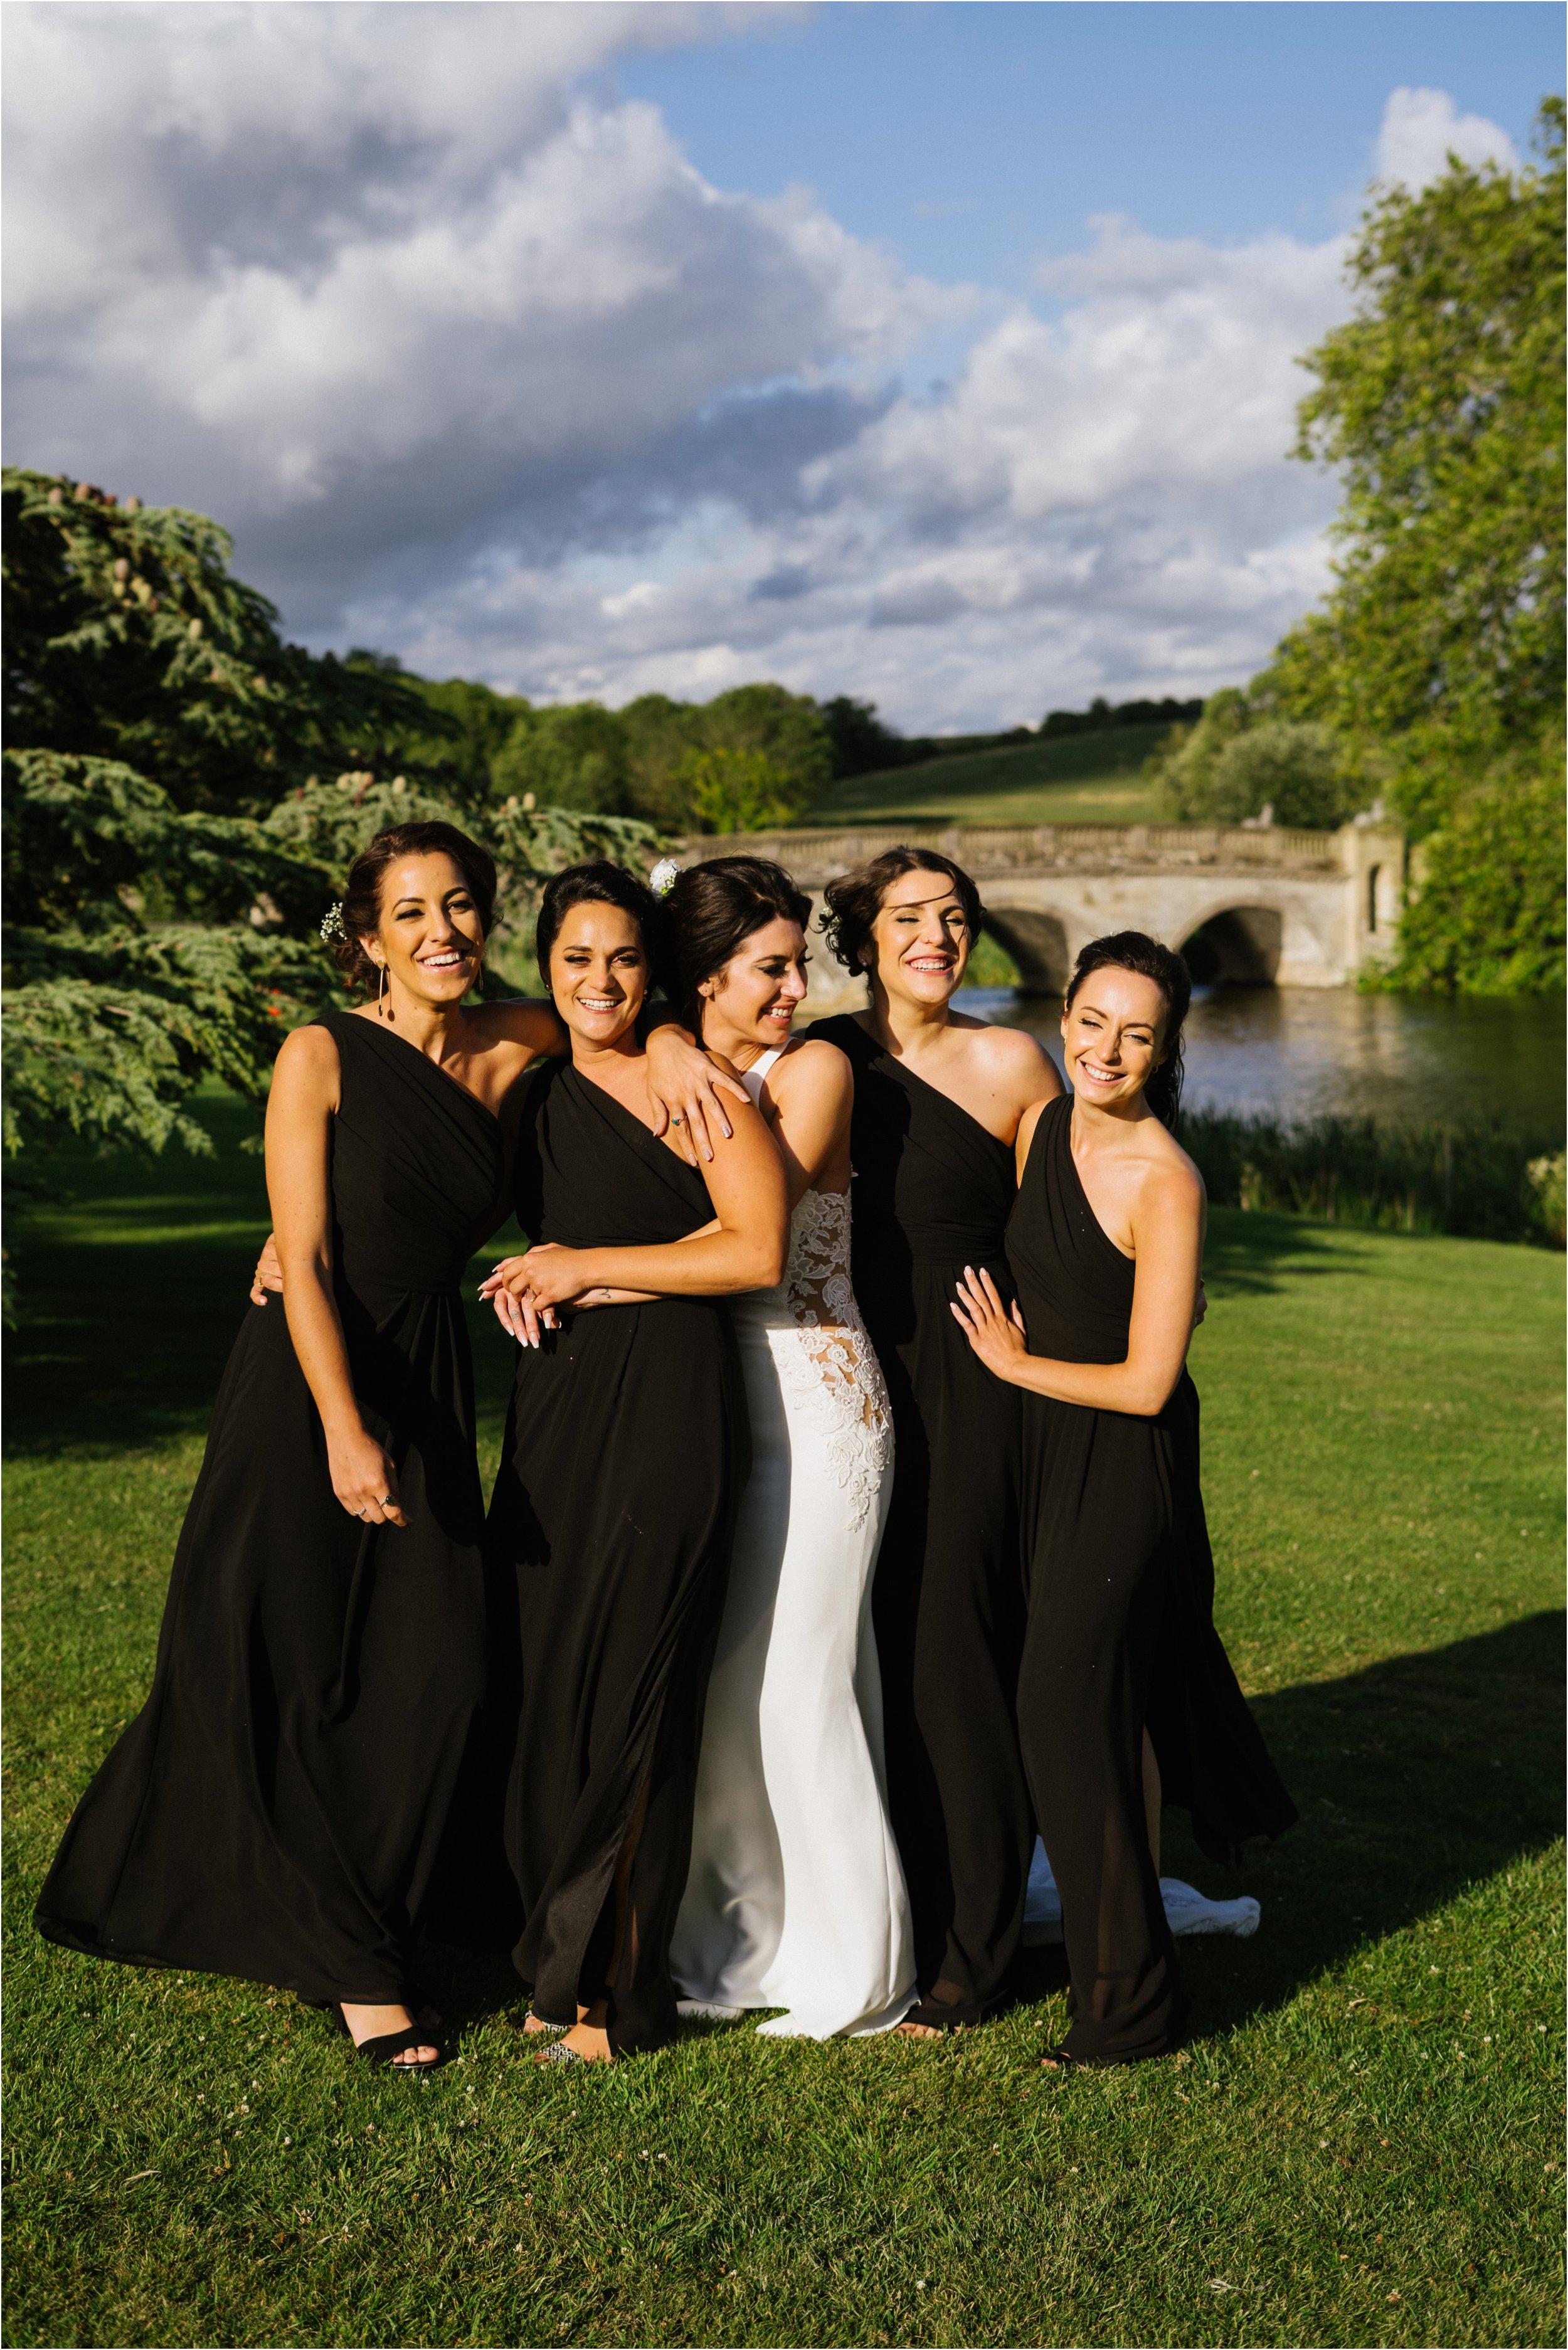 Compton Verney wedding photography_0134.jpg